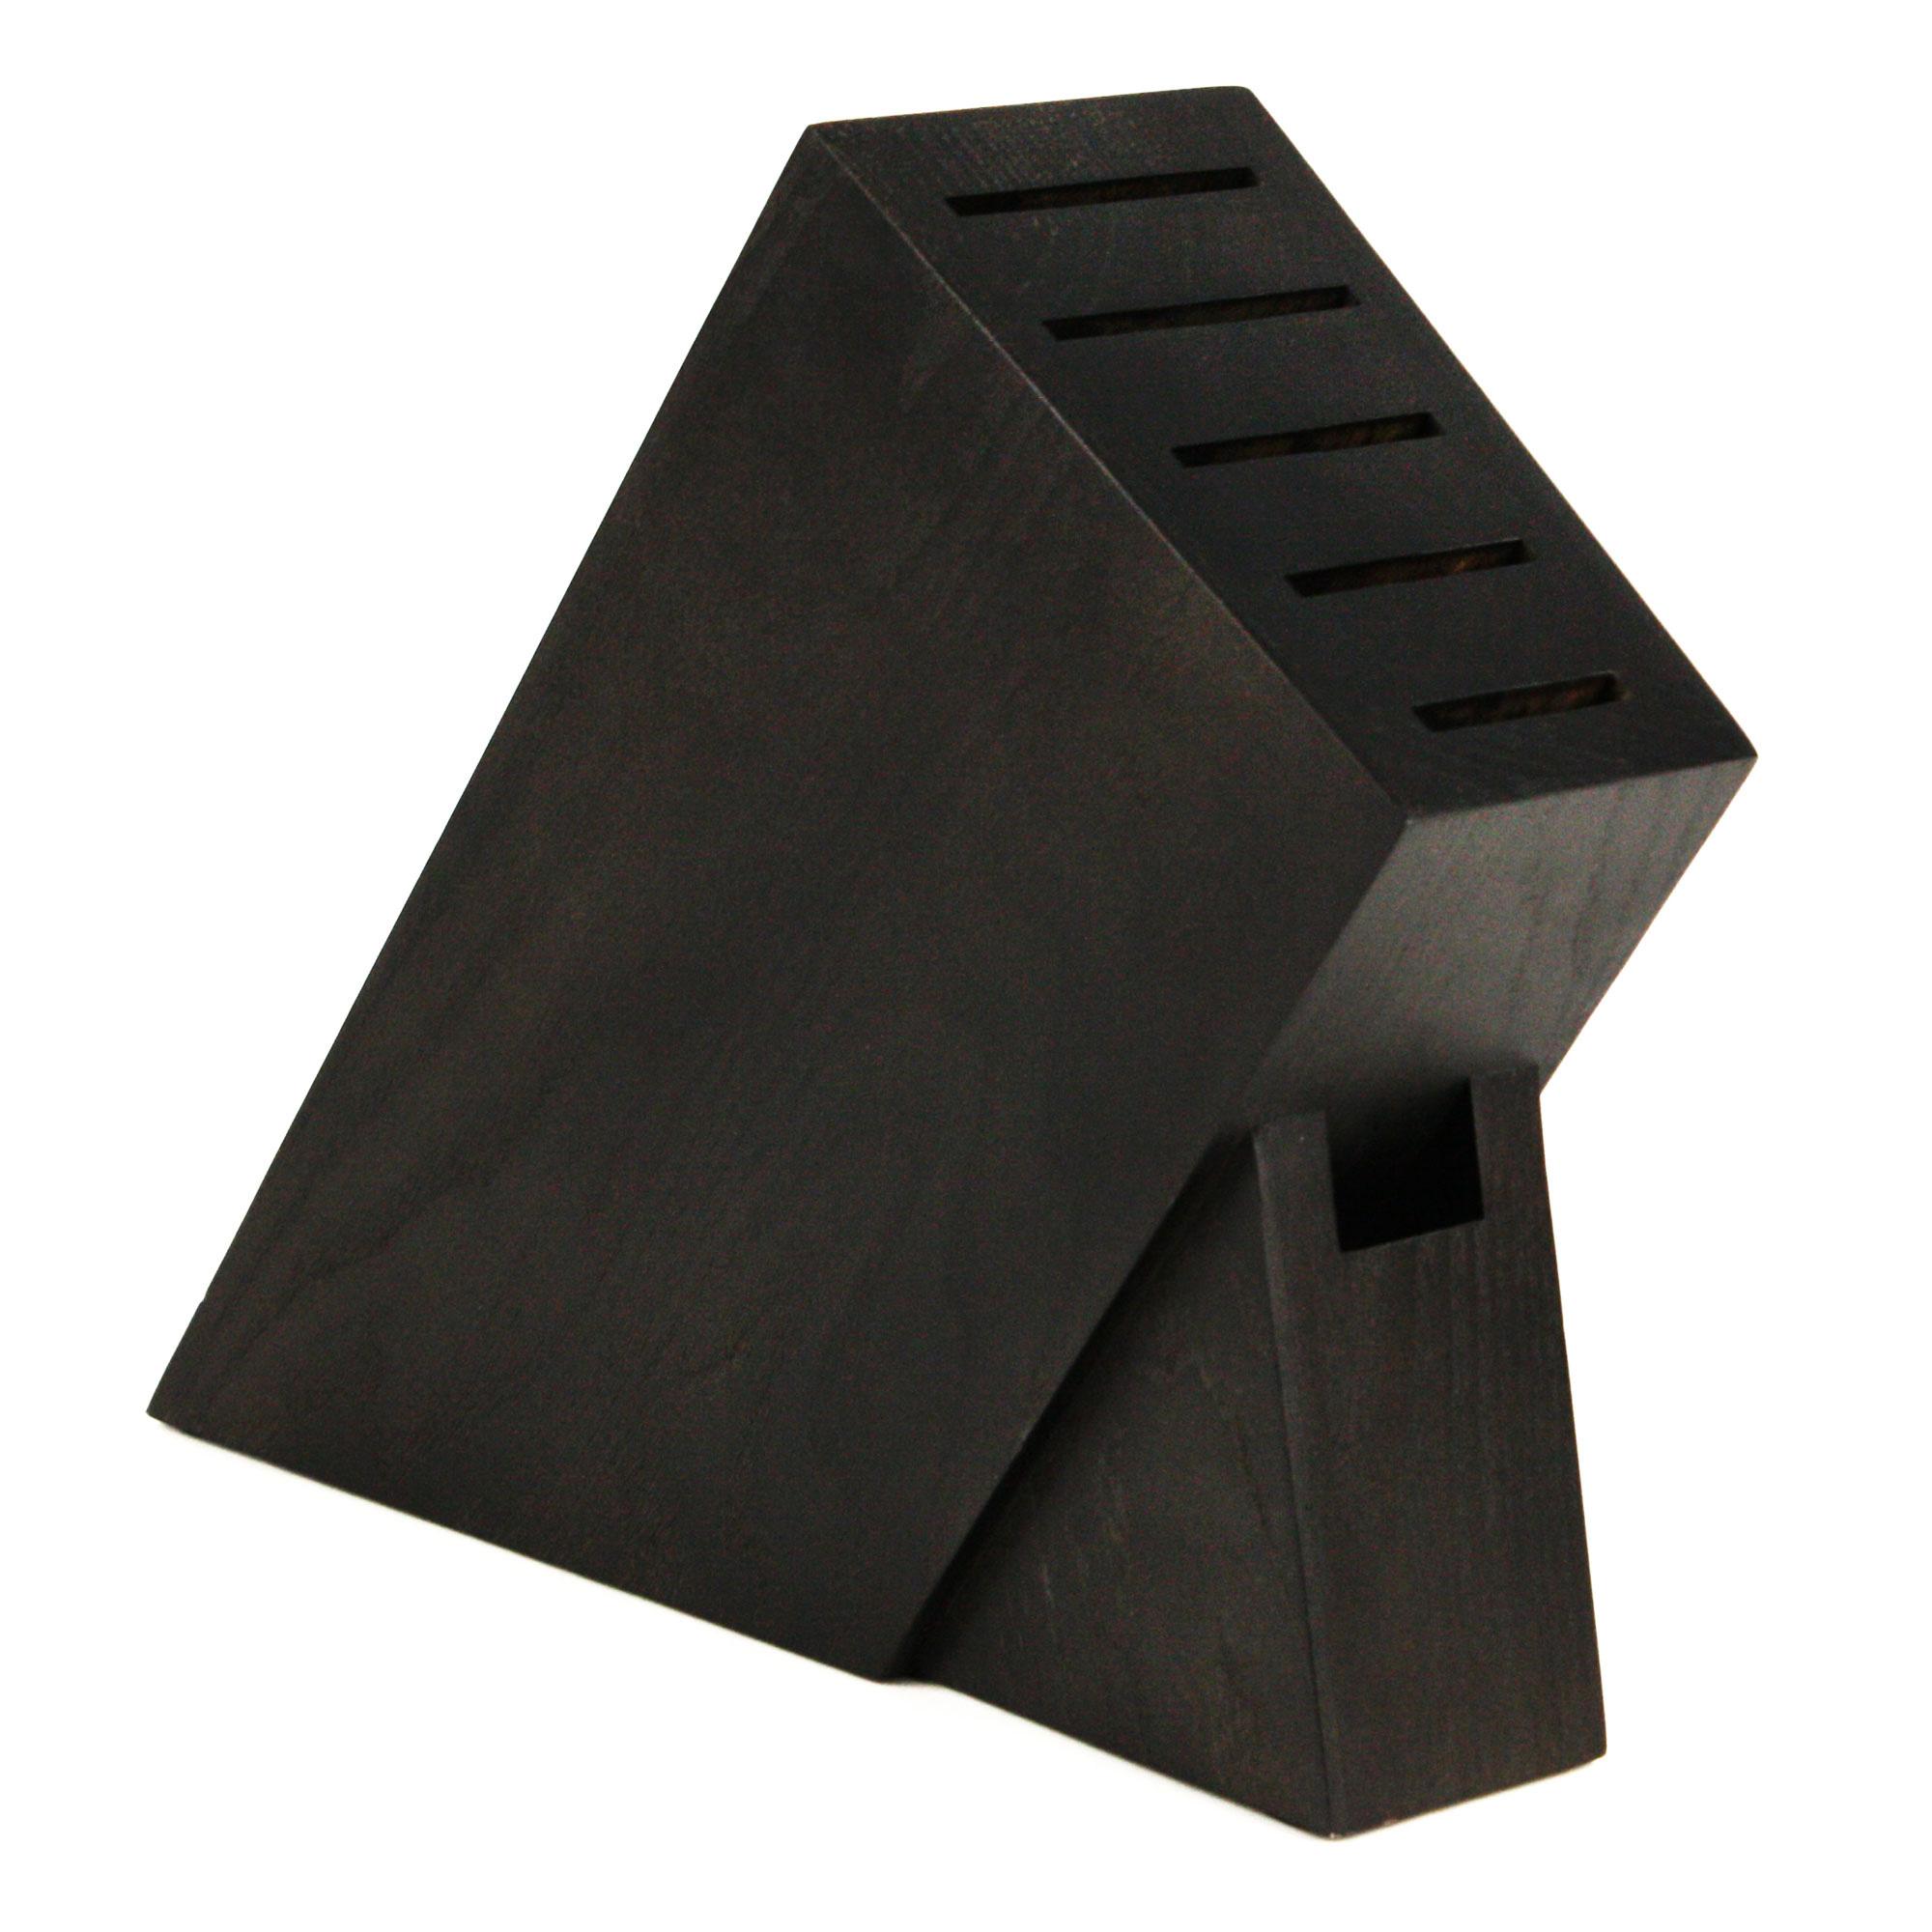 Yaxell Super Gou Slim Knife Block Set 7 Piece Black